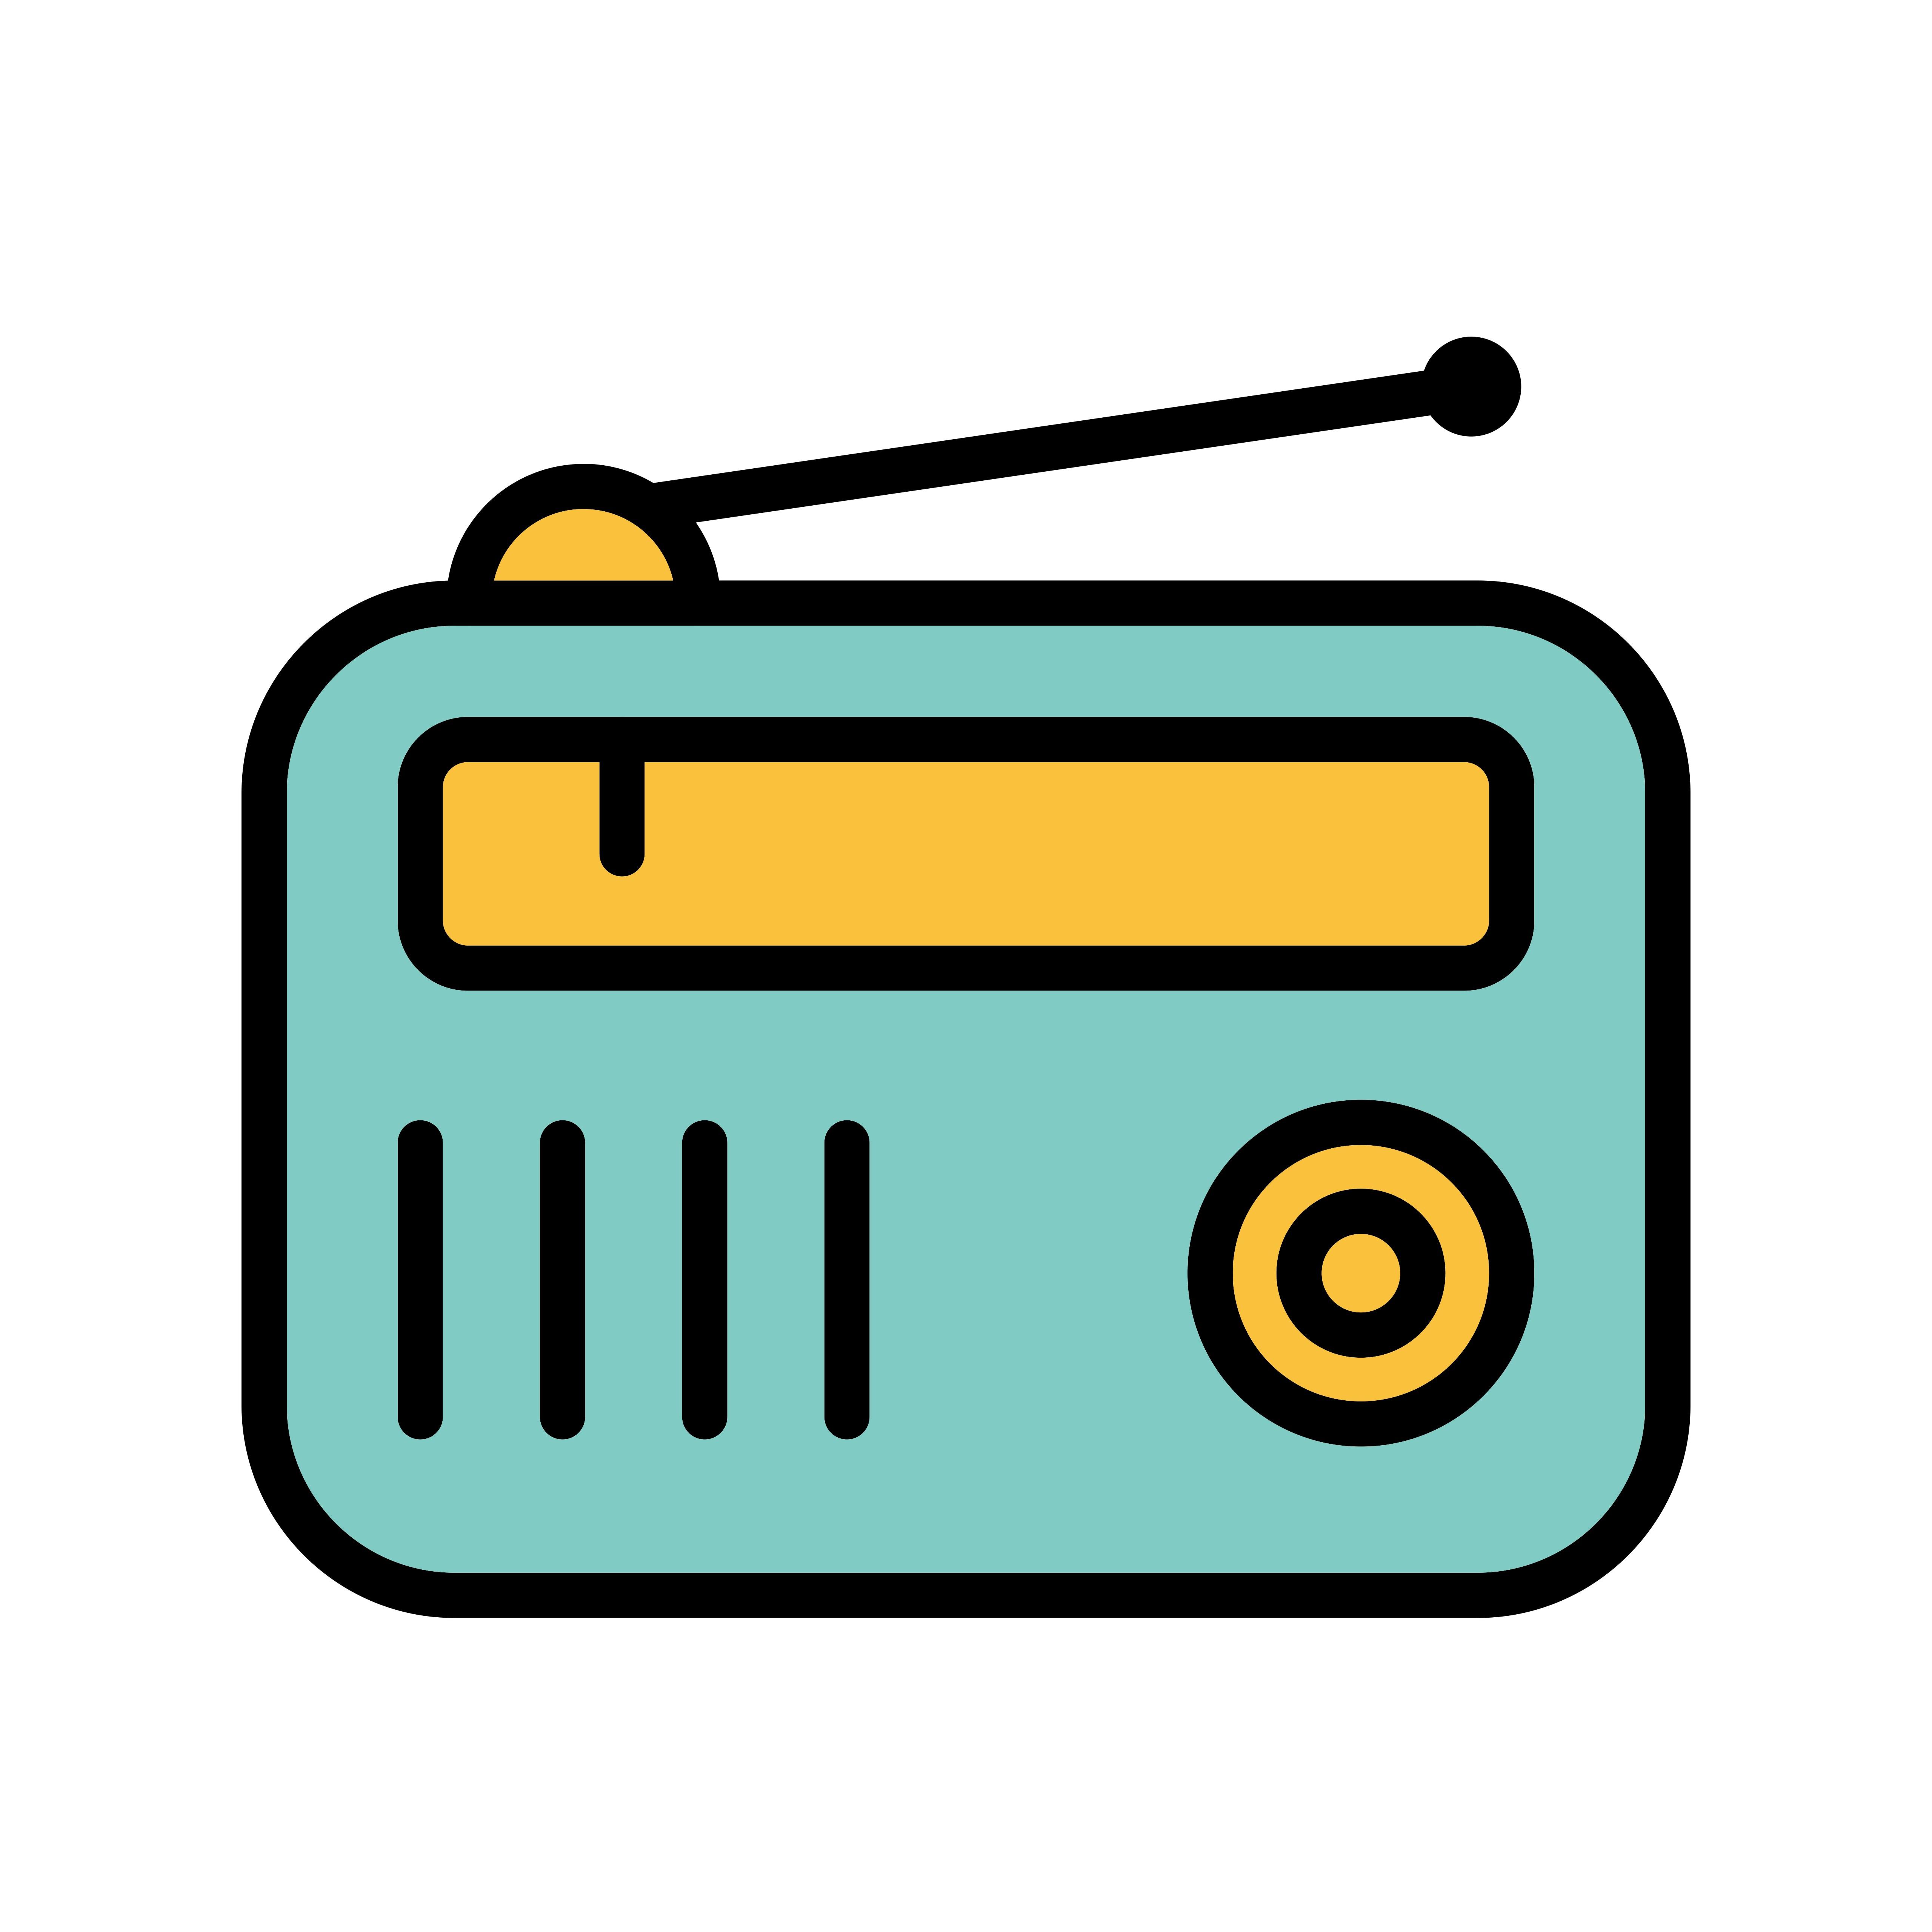 Radio Vector Icon Download Free Vector Art Stock